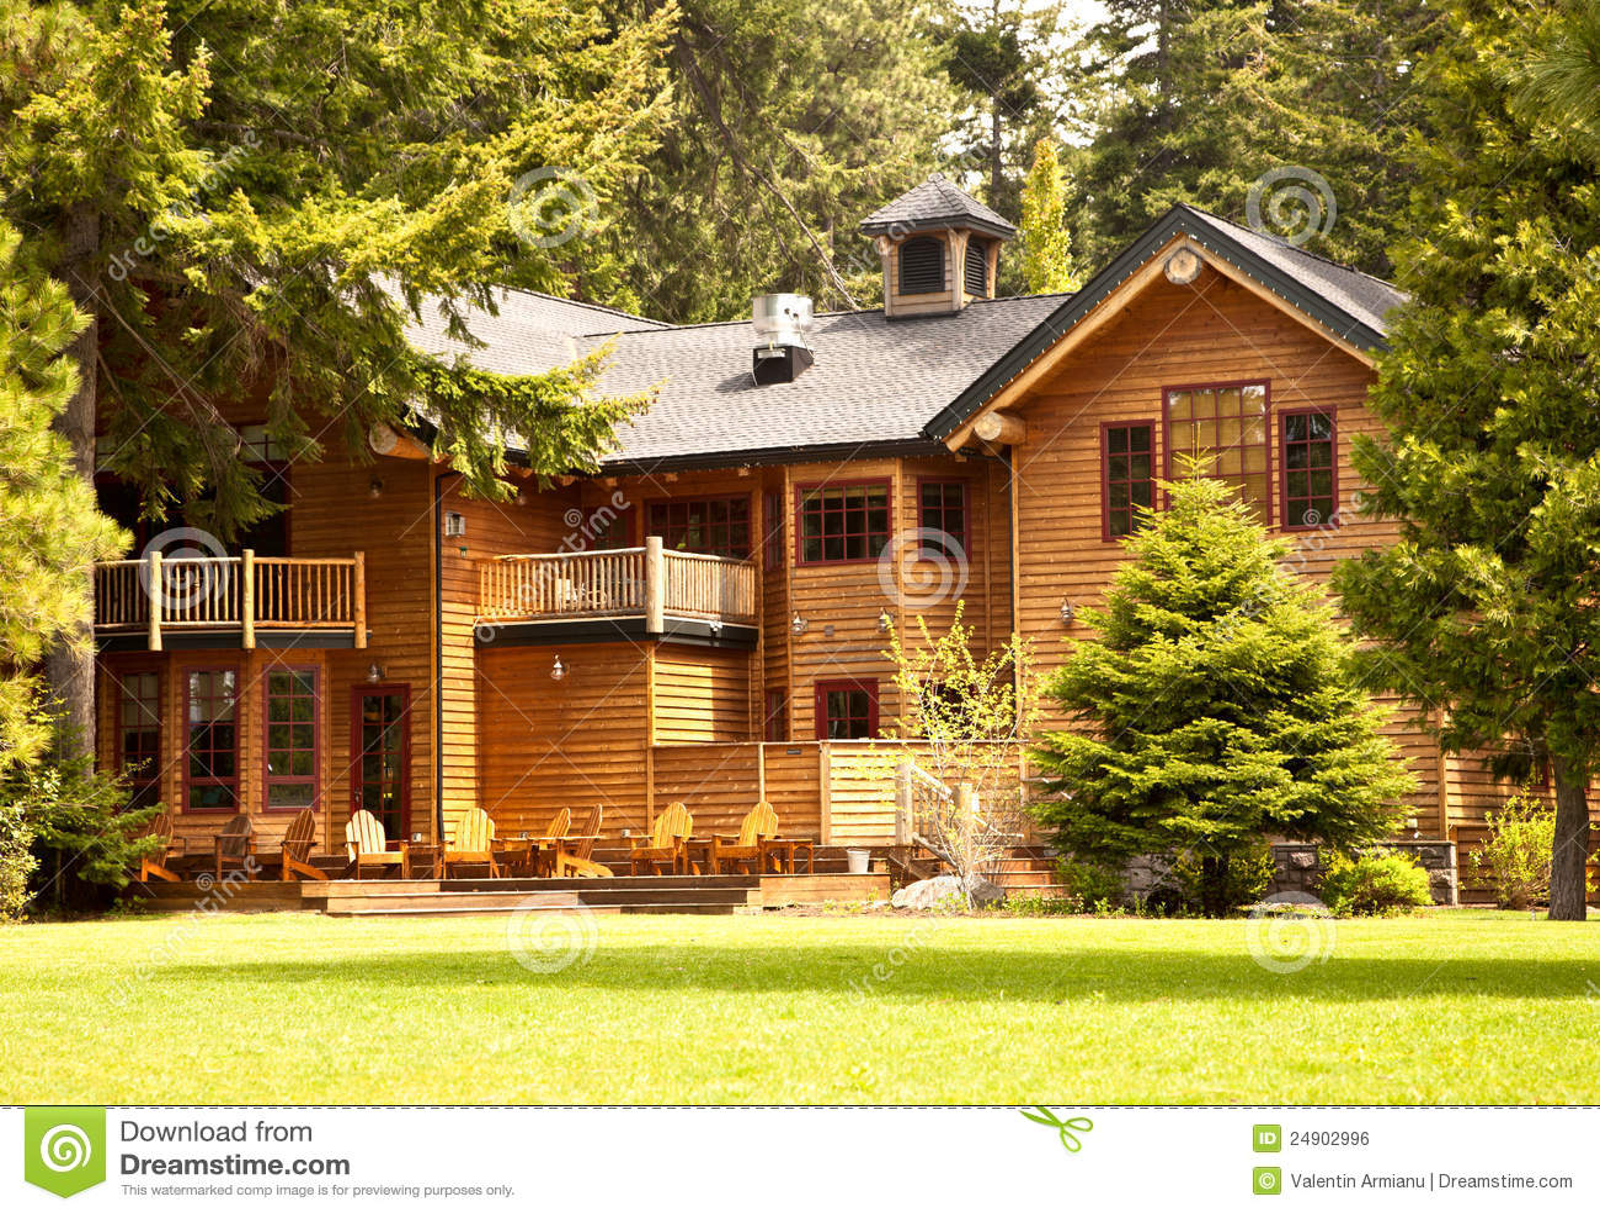 Kitchen Designers In Maryland Mountain Log Cabin Royalty Free Stock Image Image 24902996